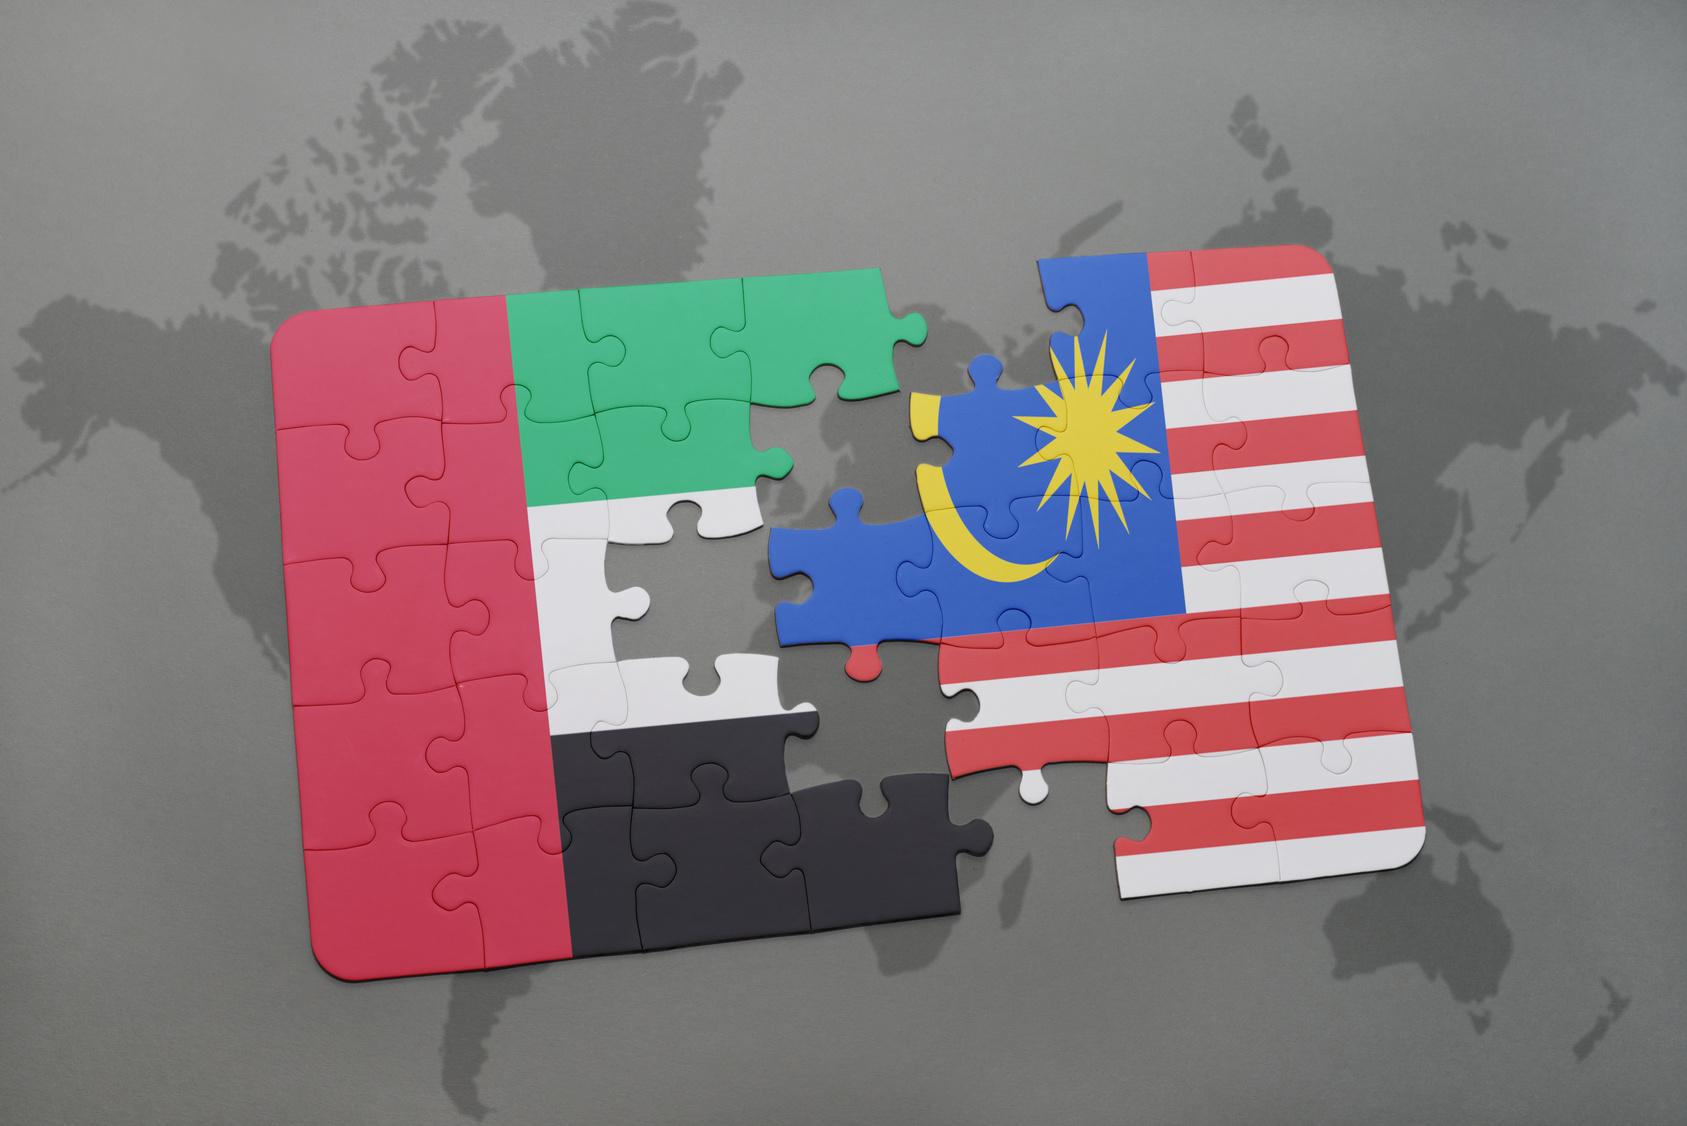 No gulf between Abu Dhabi and Malaysia for fintech friendship